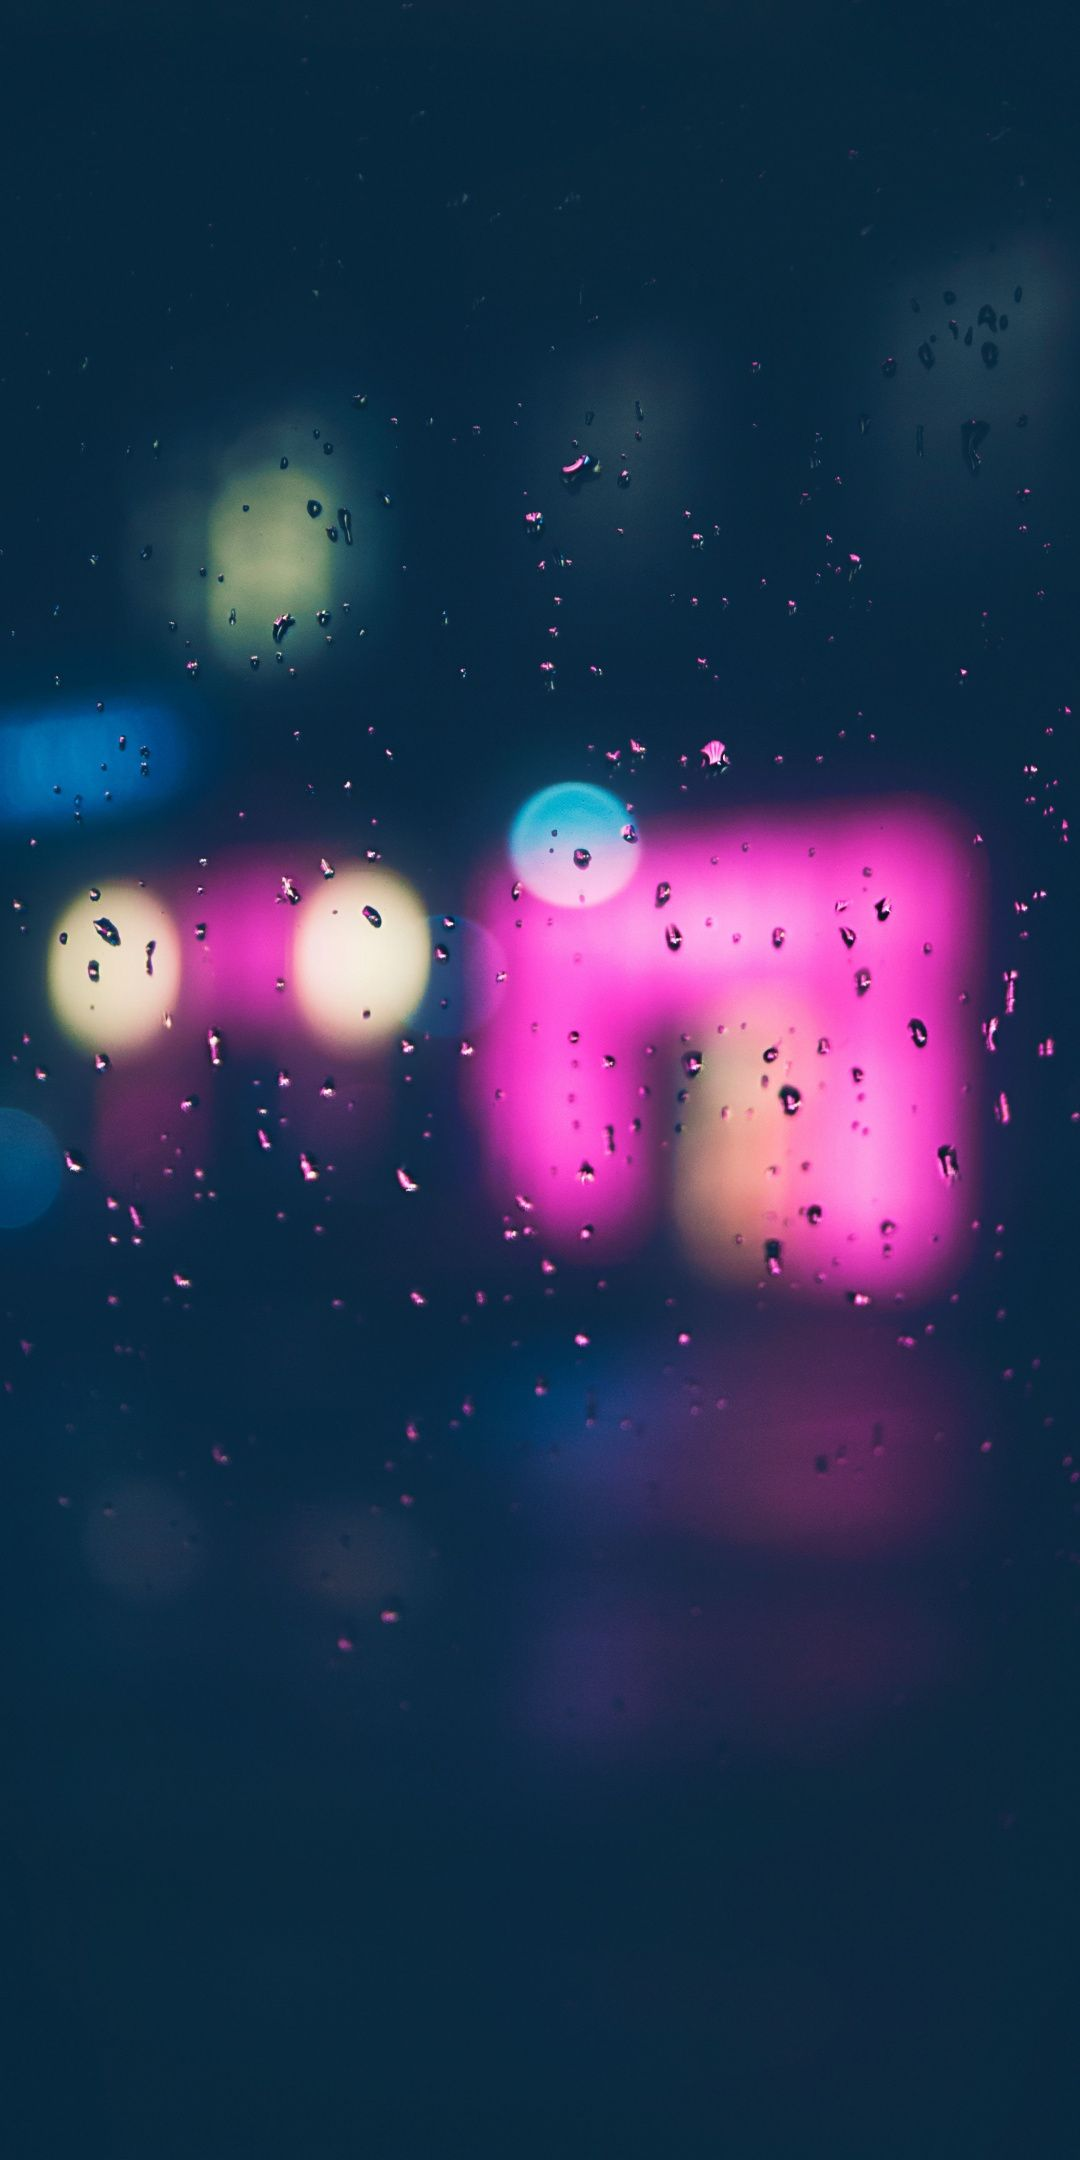 Glass Drops Bokeh Minimal 1080x2160 Wallpaper Huawei Wallpapers Scenic Wallpaper Bokeh Wallpaper